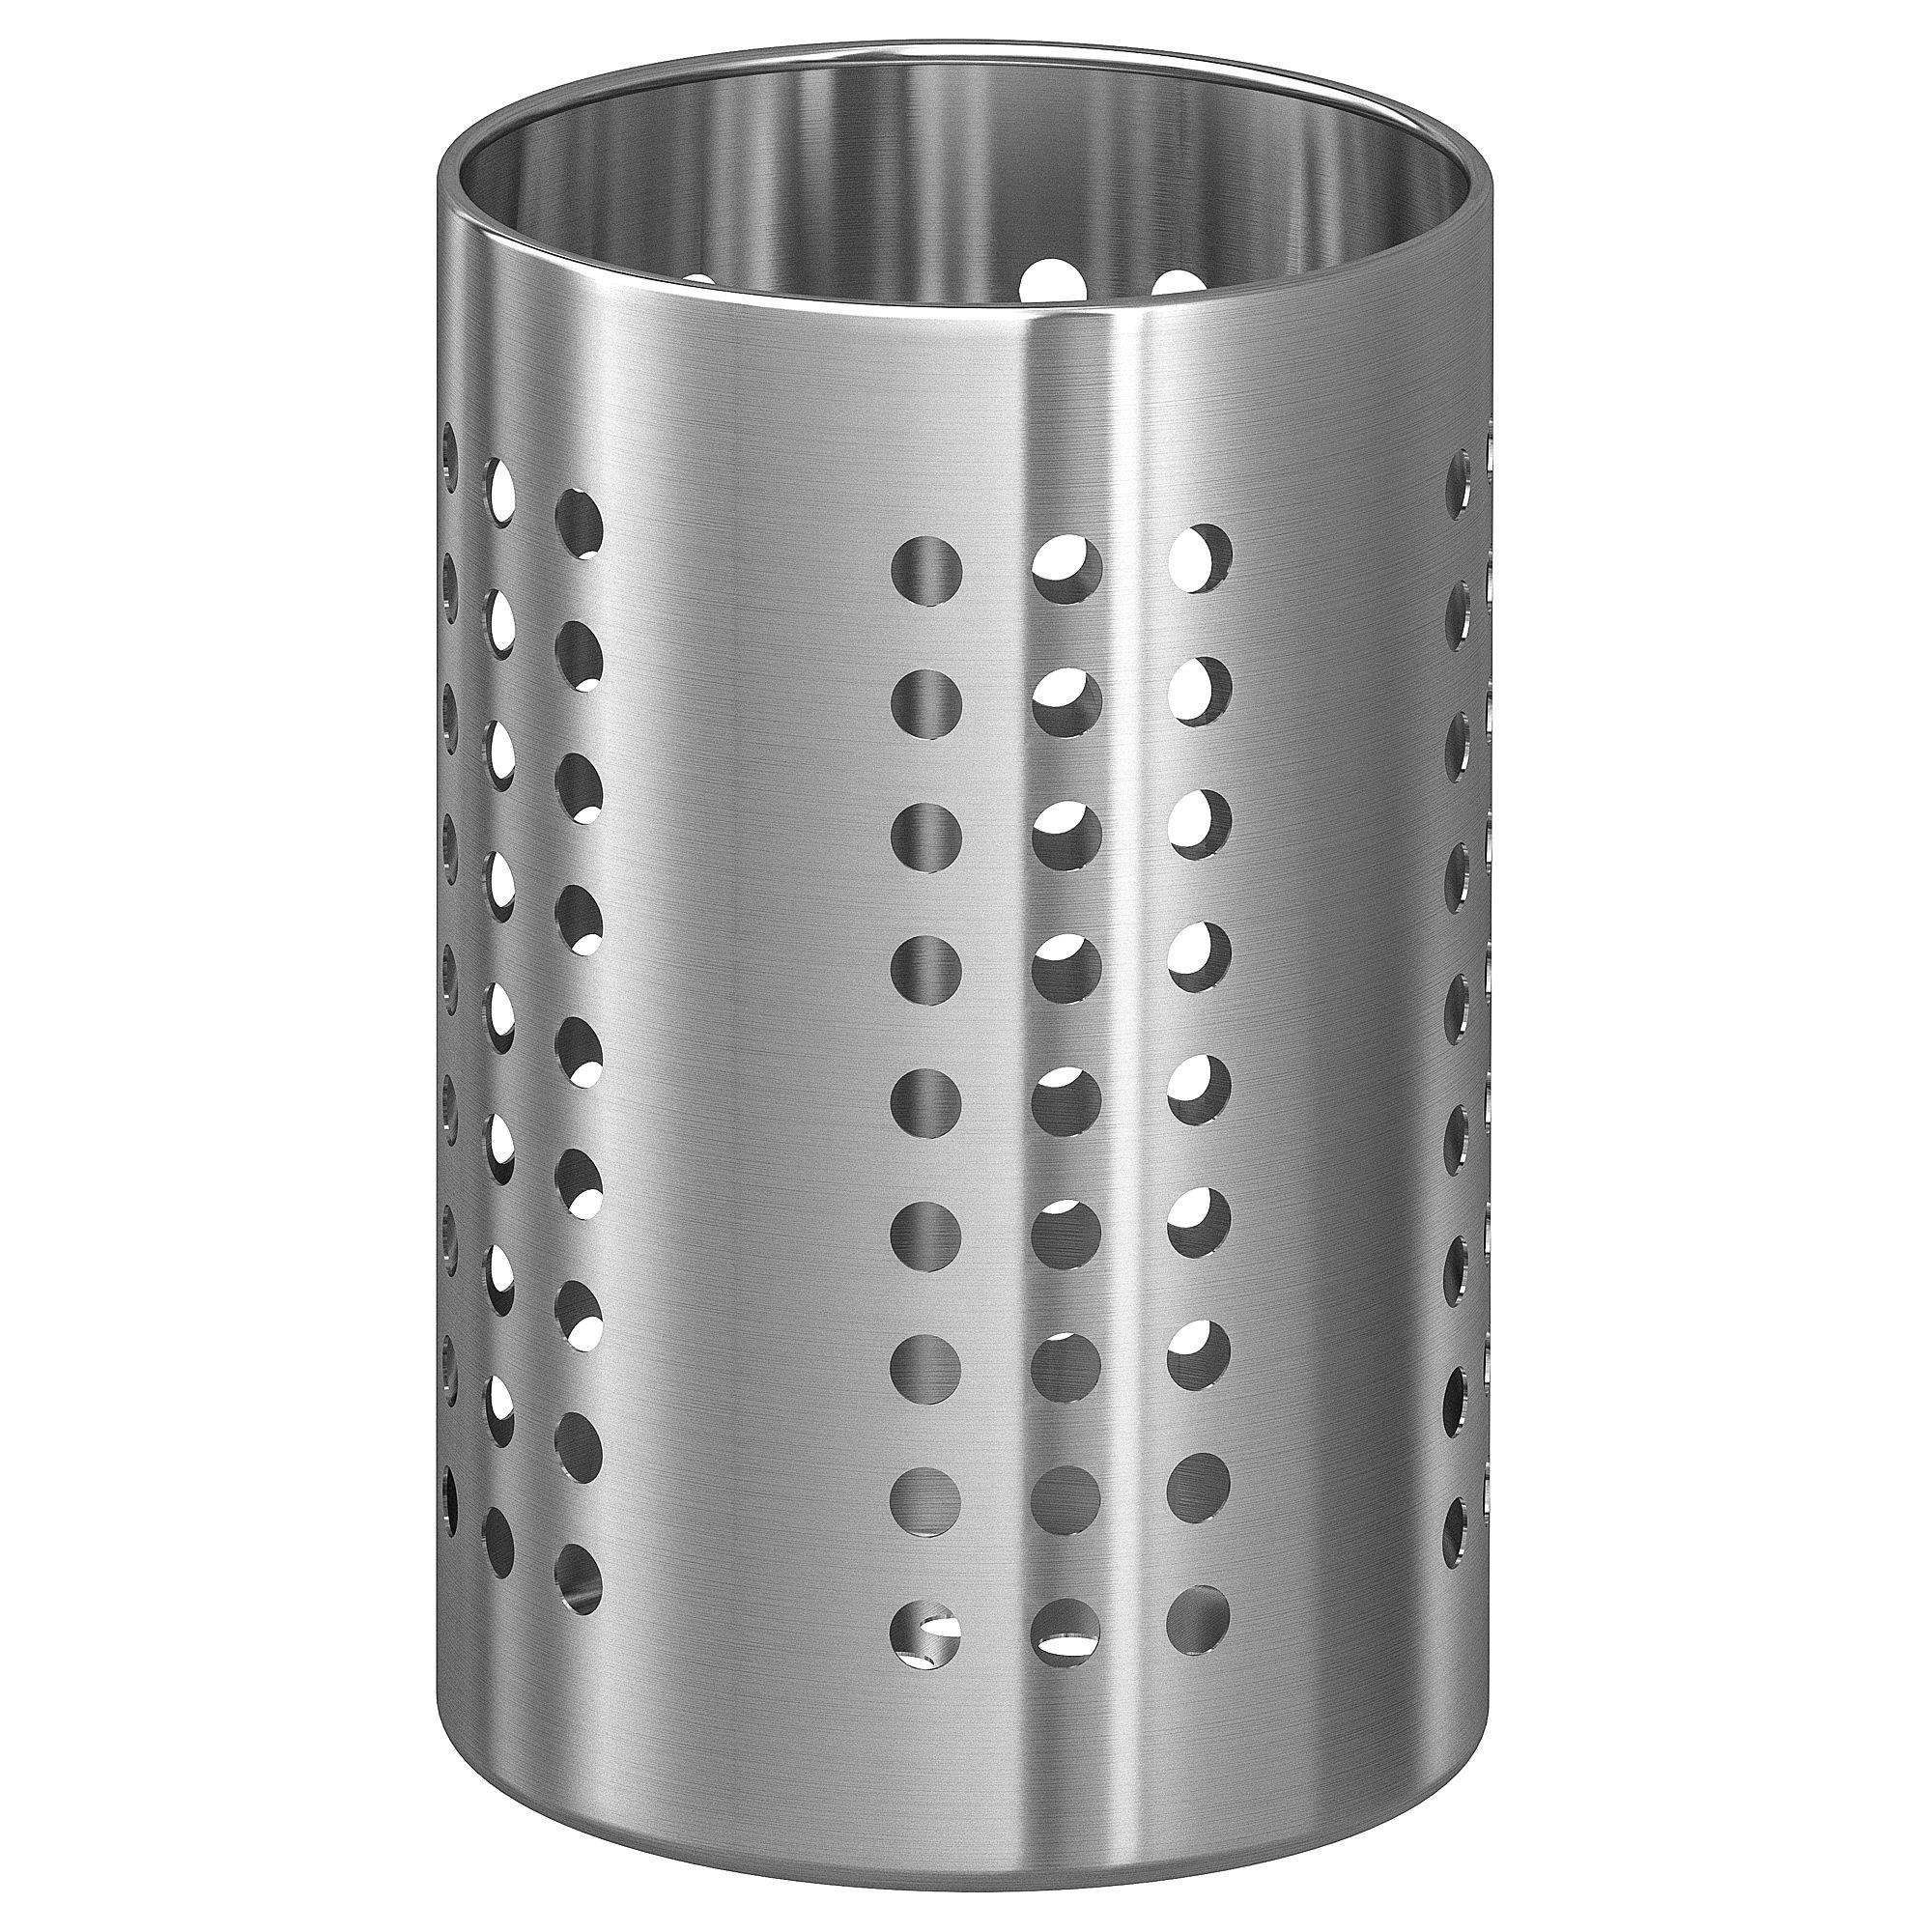 Ordning Utensil Holder Stainless Steel 7 1 8 With Images